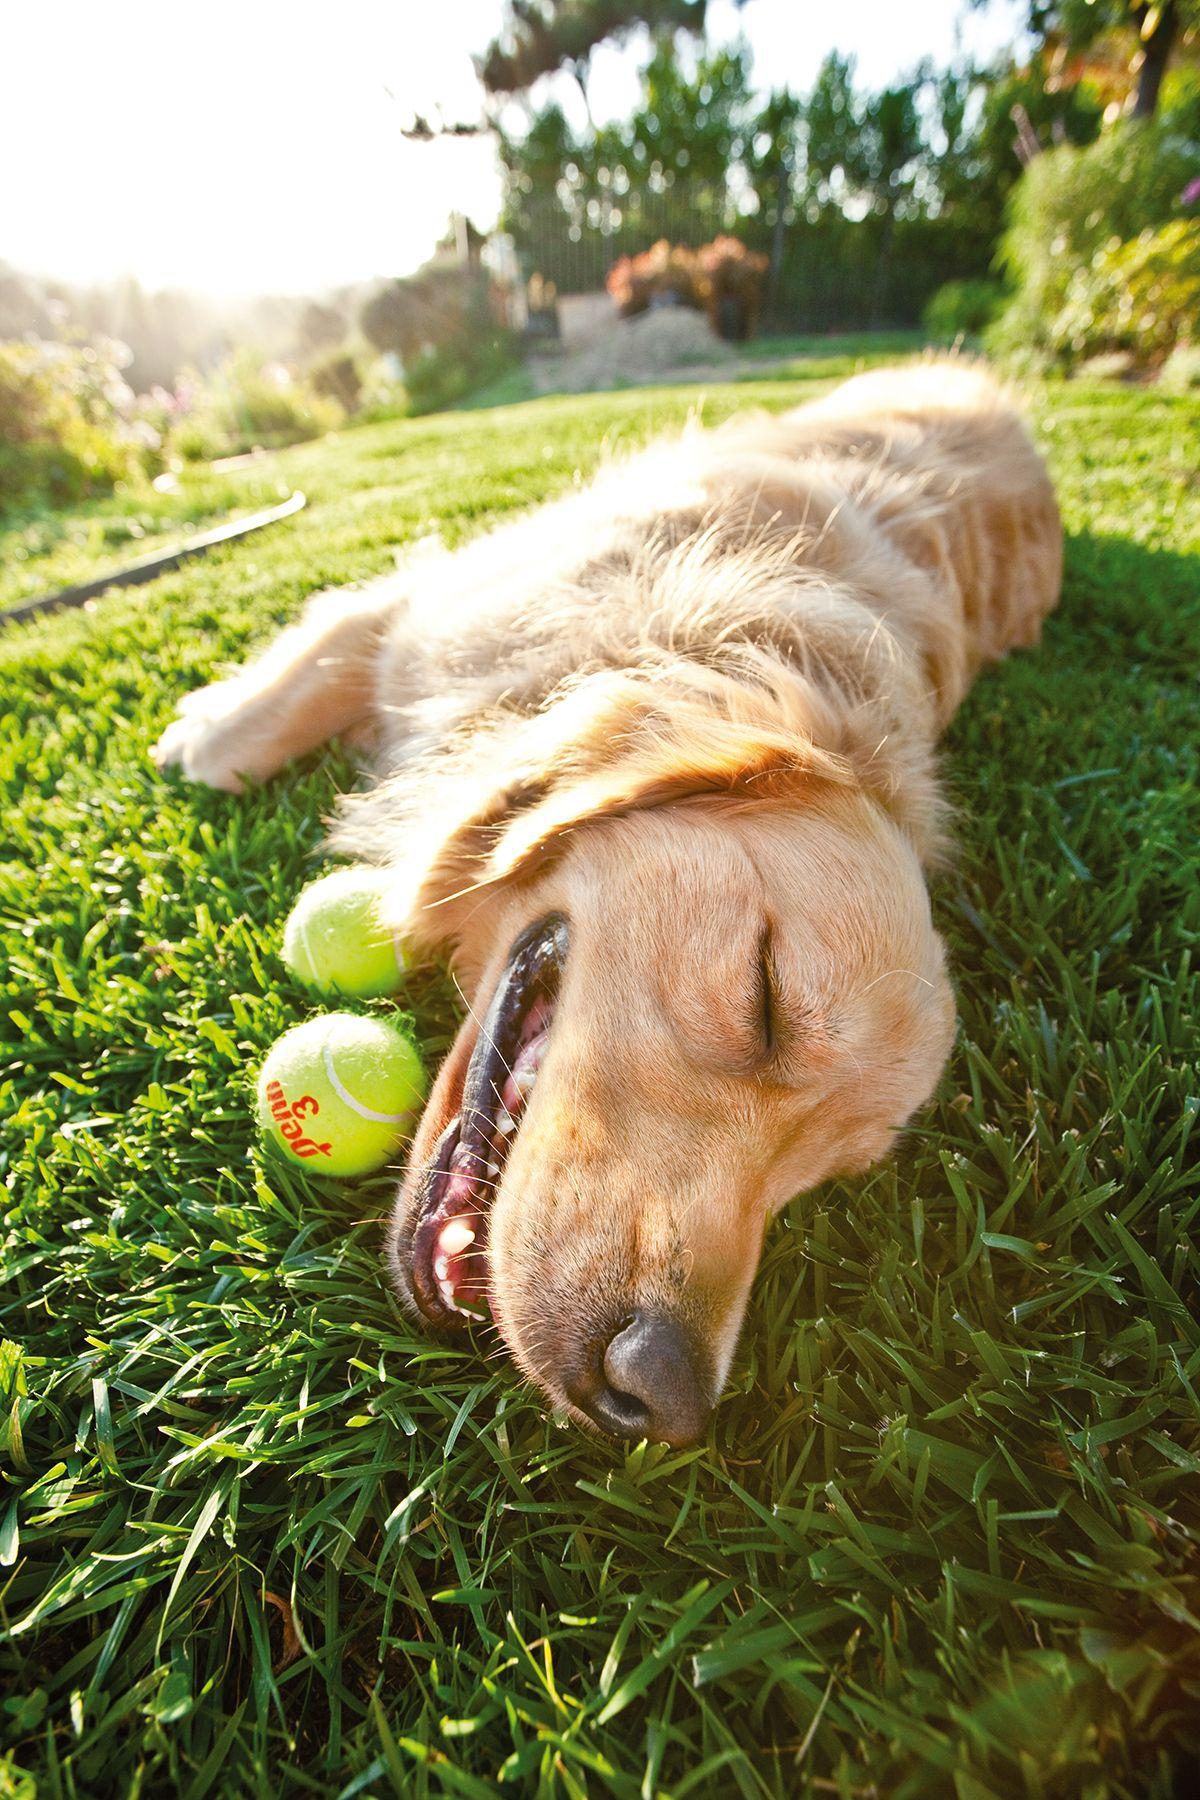 Jackson the Golden Retriever smiles for a pet portrait with a tennis ball.